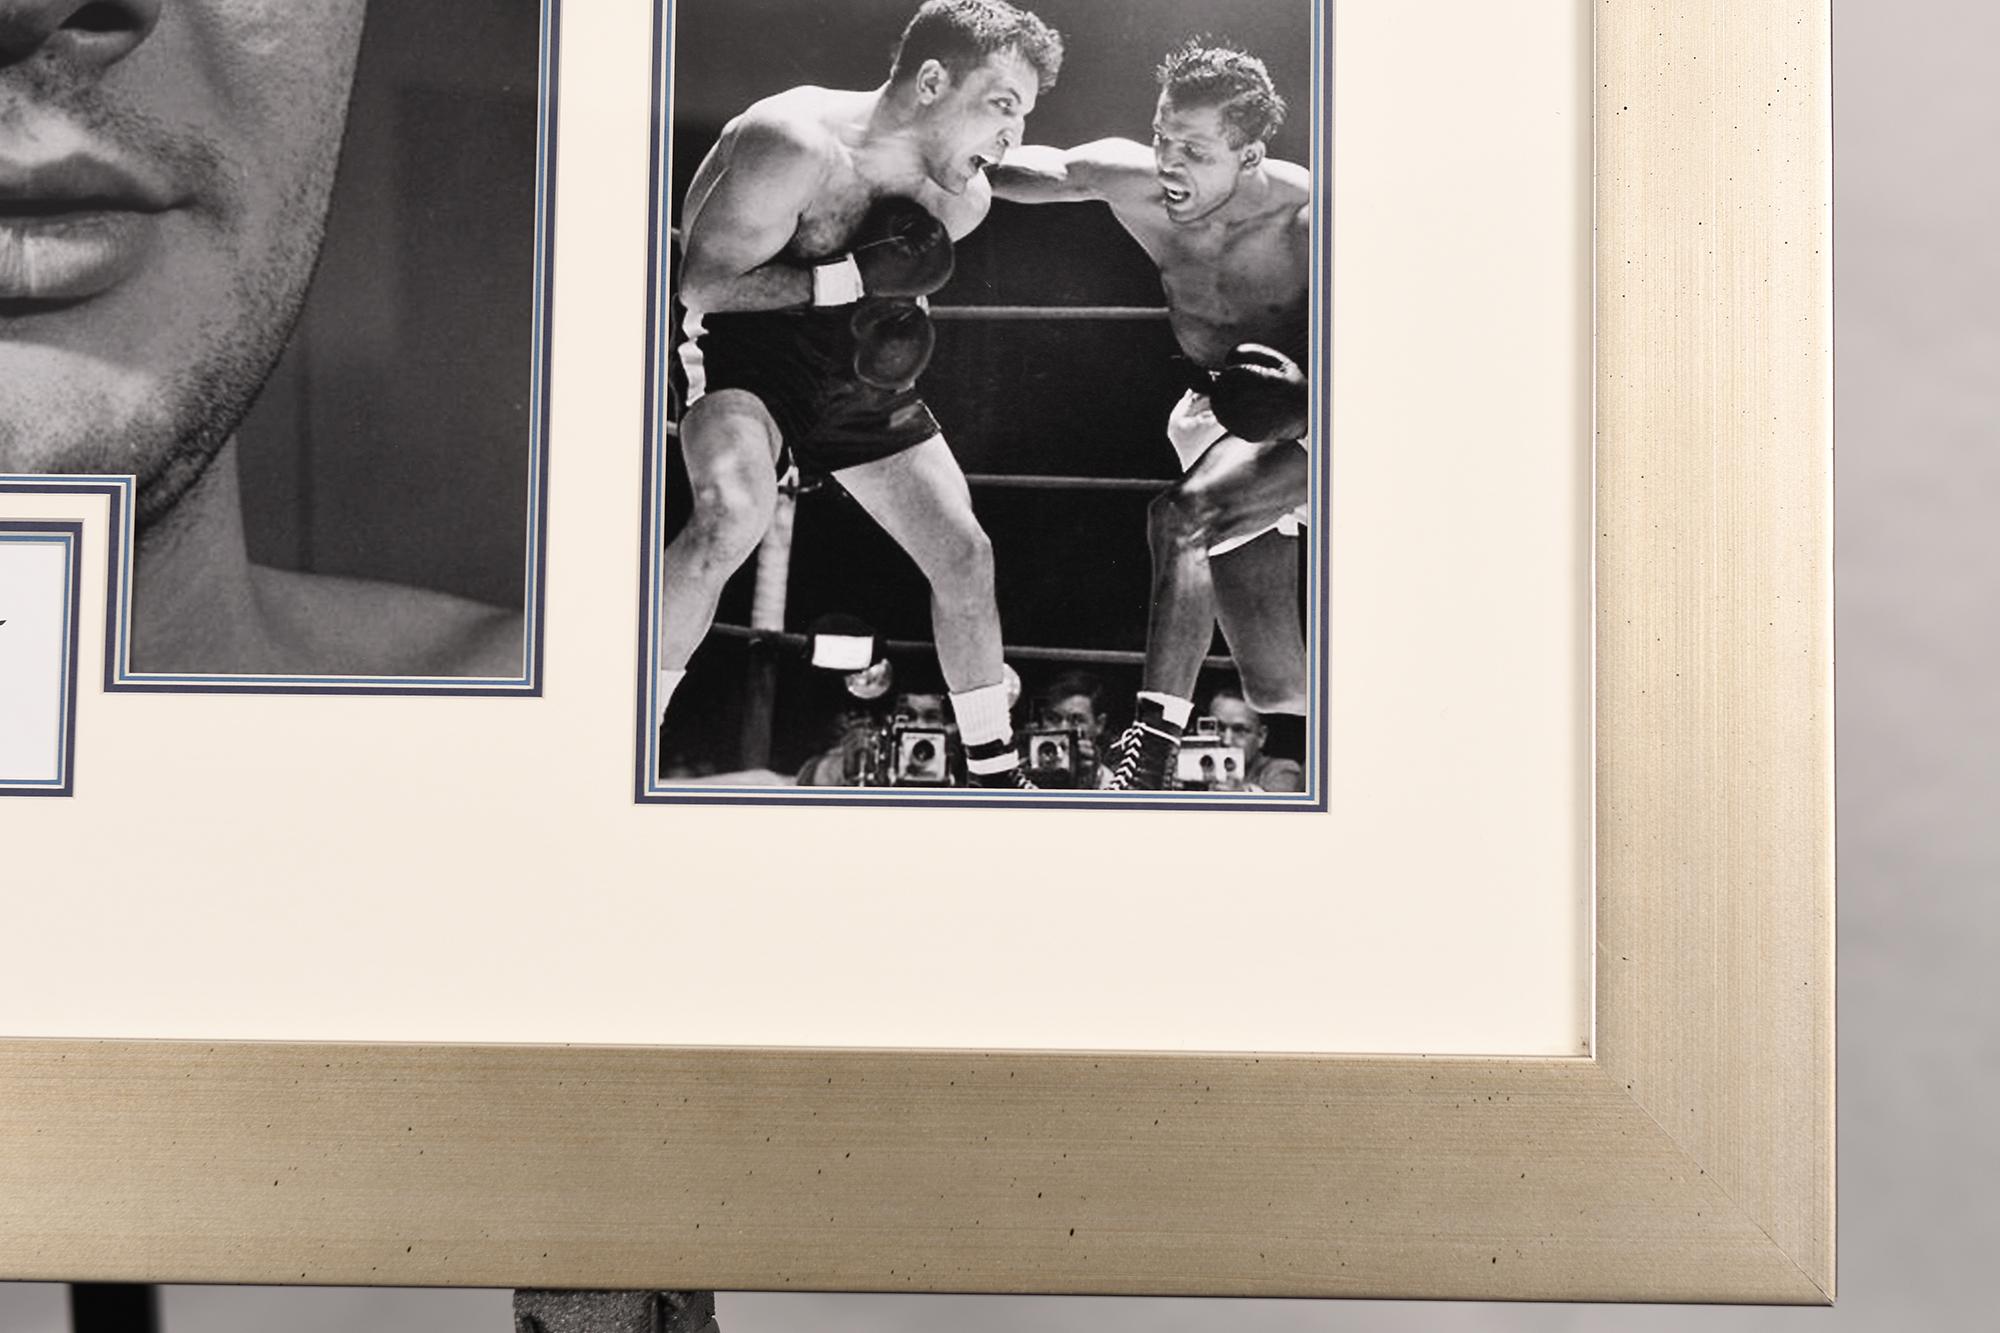 Jake Lamotta Framed Signature Presentation - Image 4 of 4